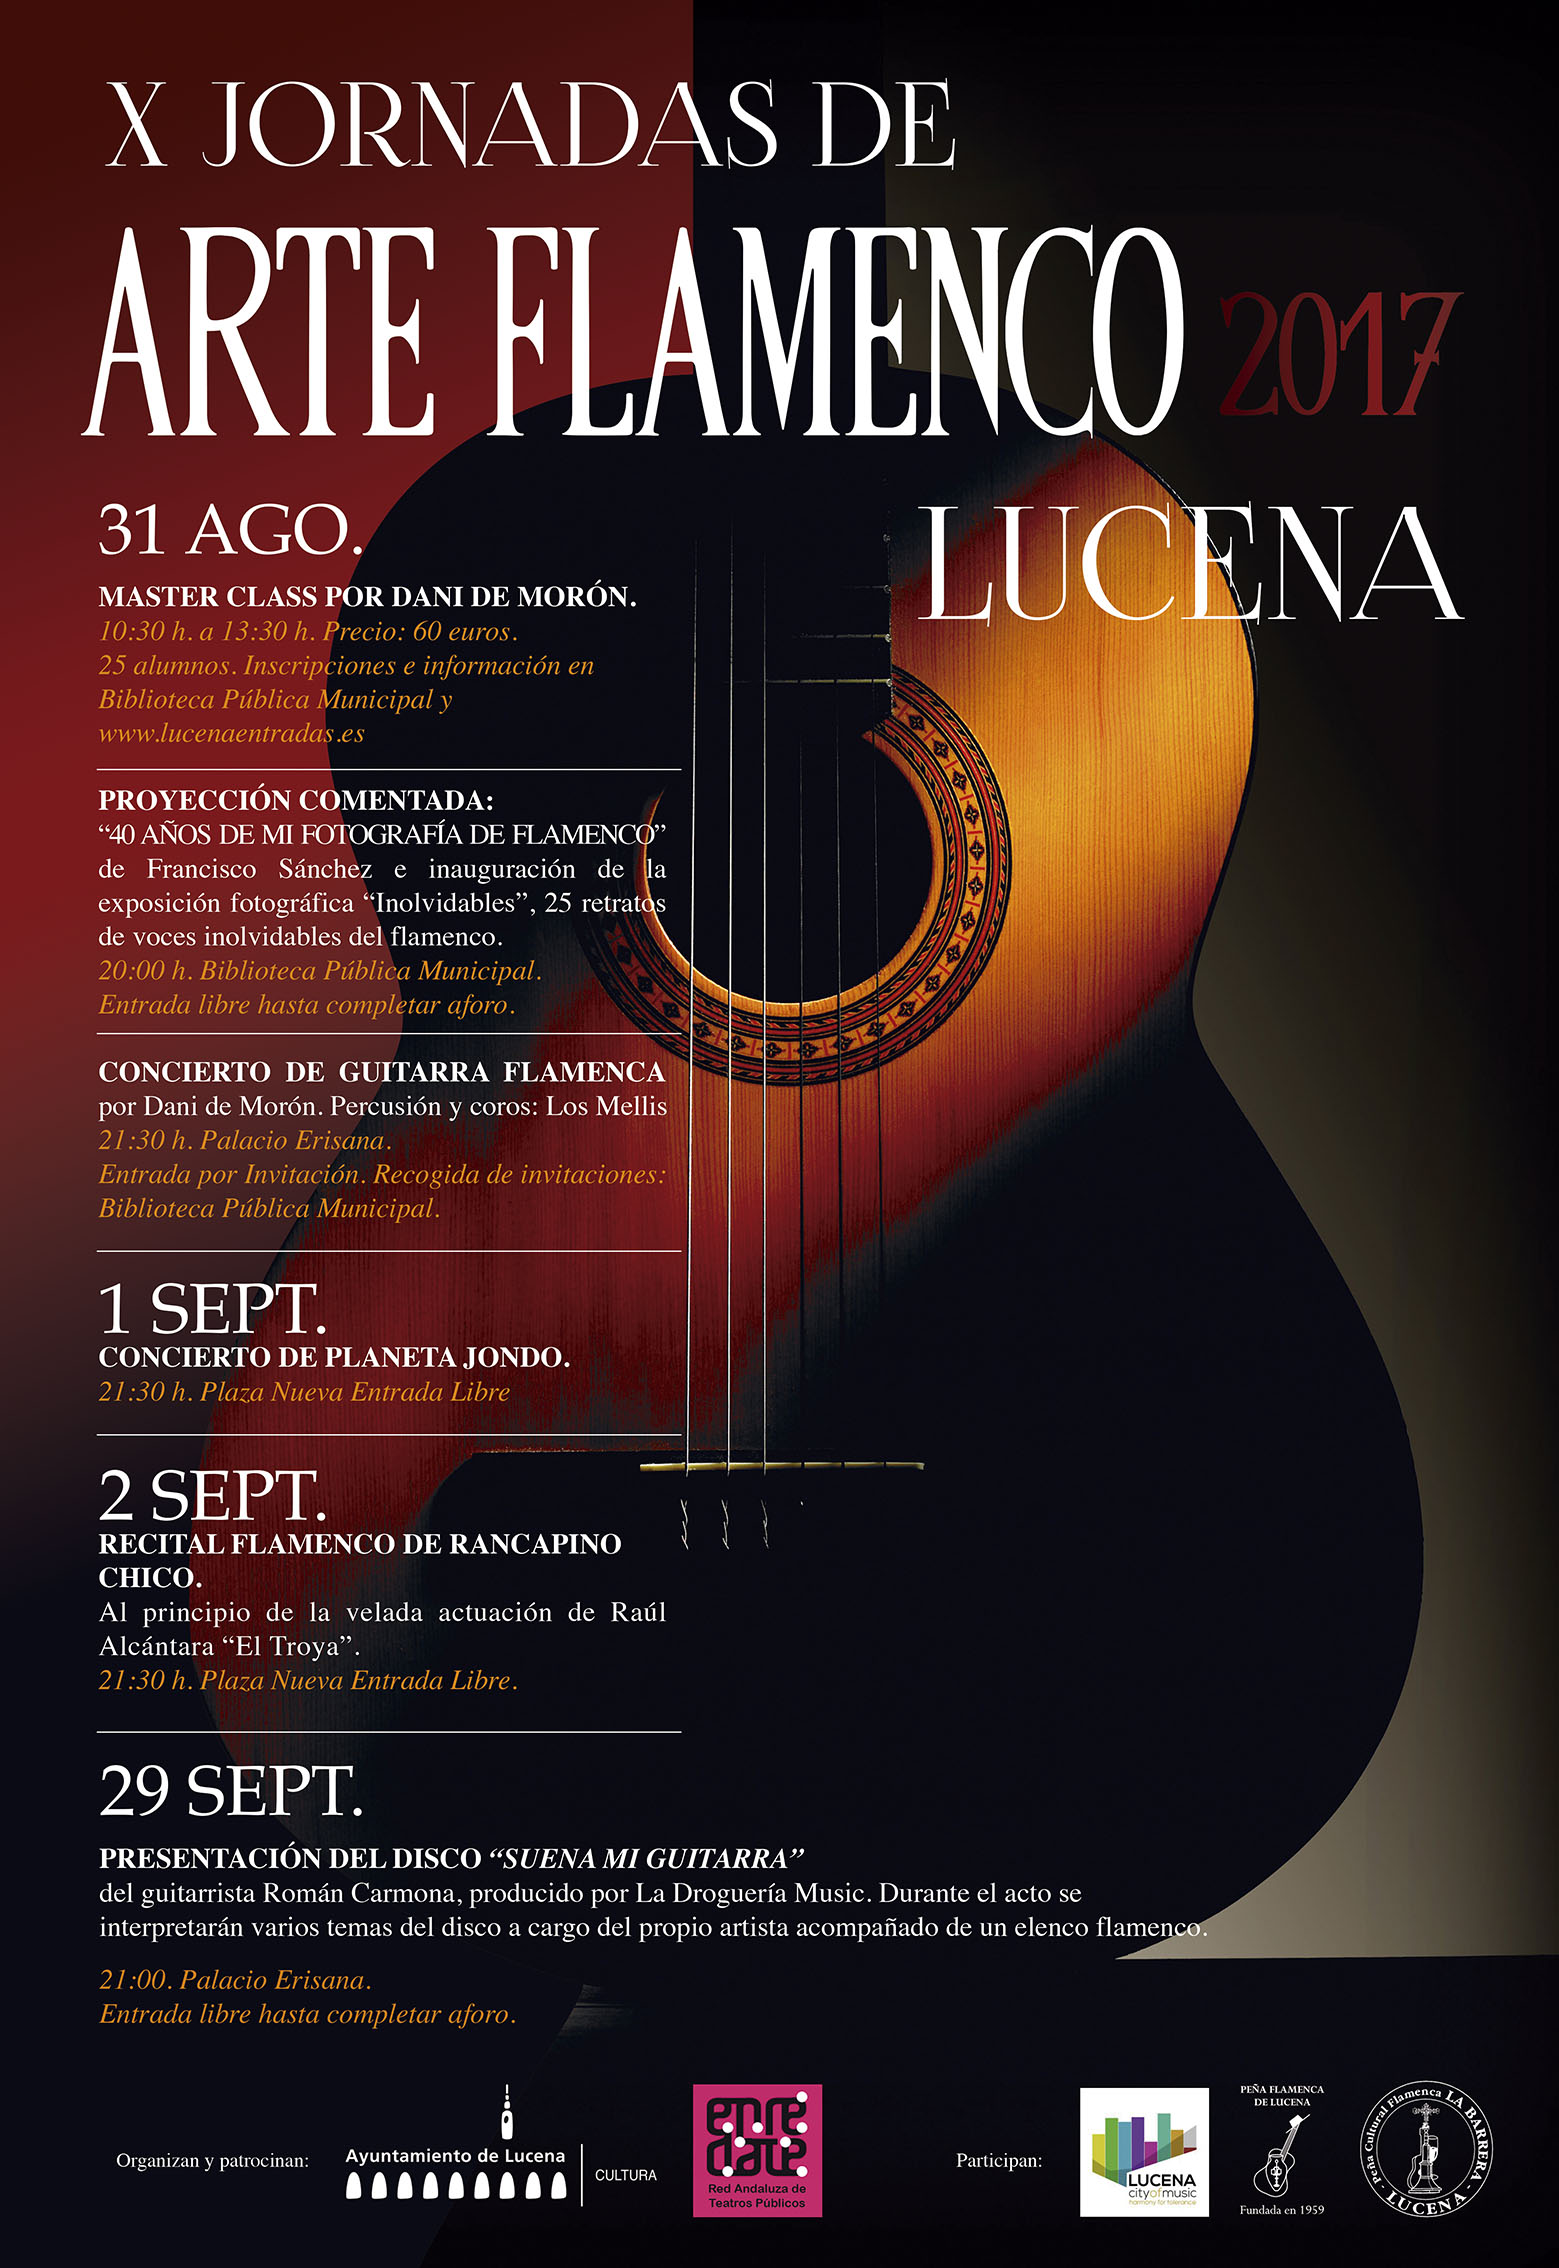 X Jornadas de Arte Flamenco: Master-Class Dani Morón @ Biblioteca Pública Municipal